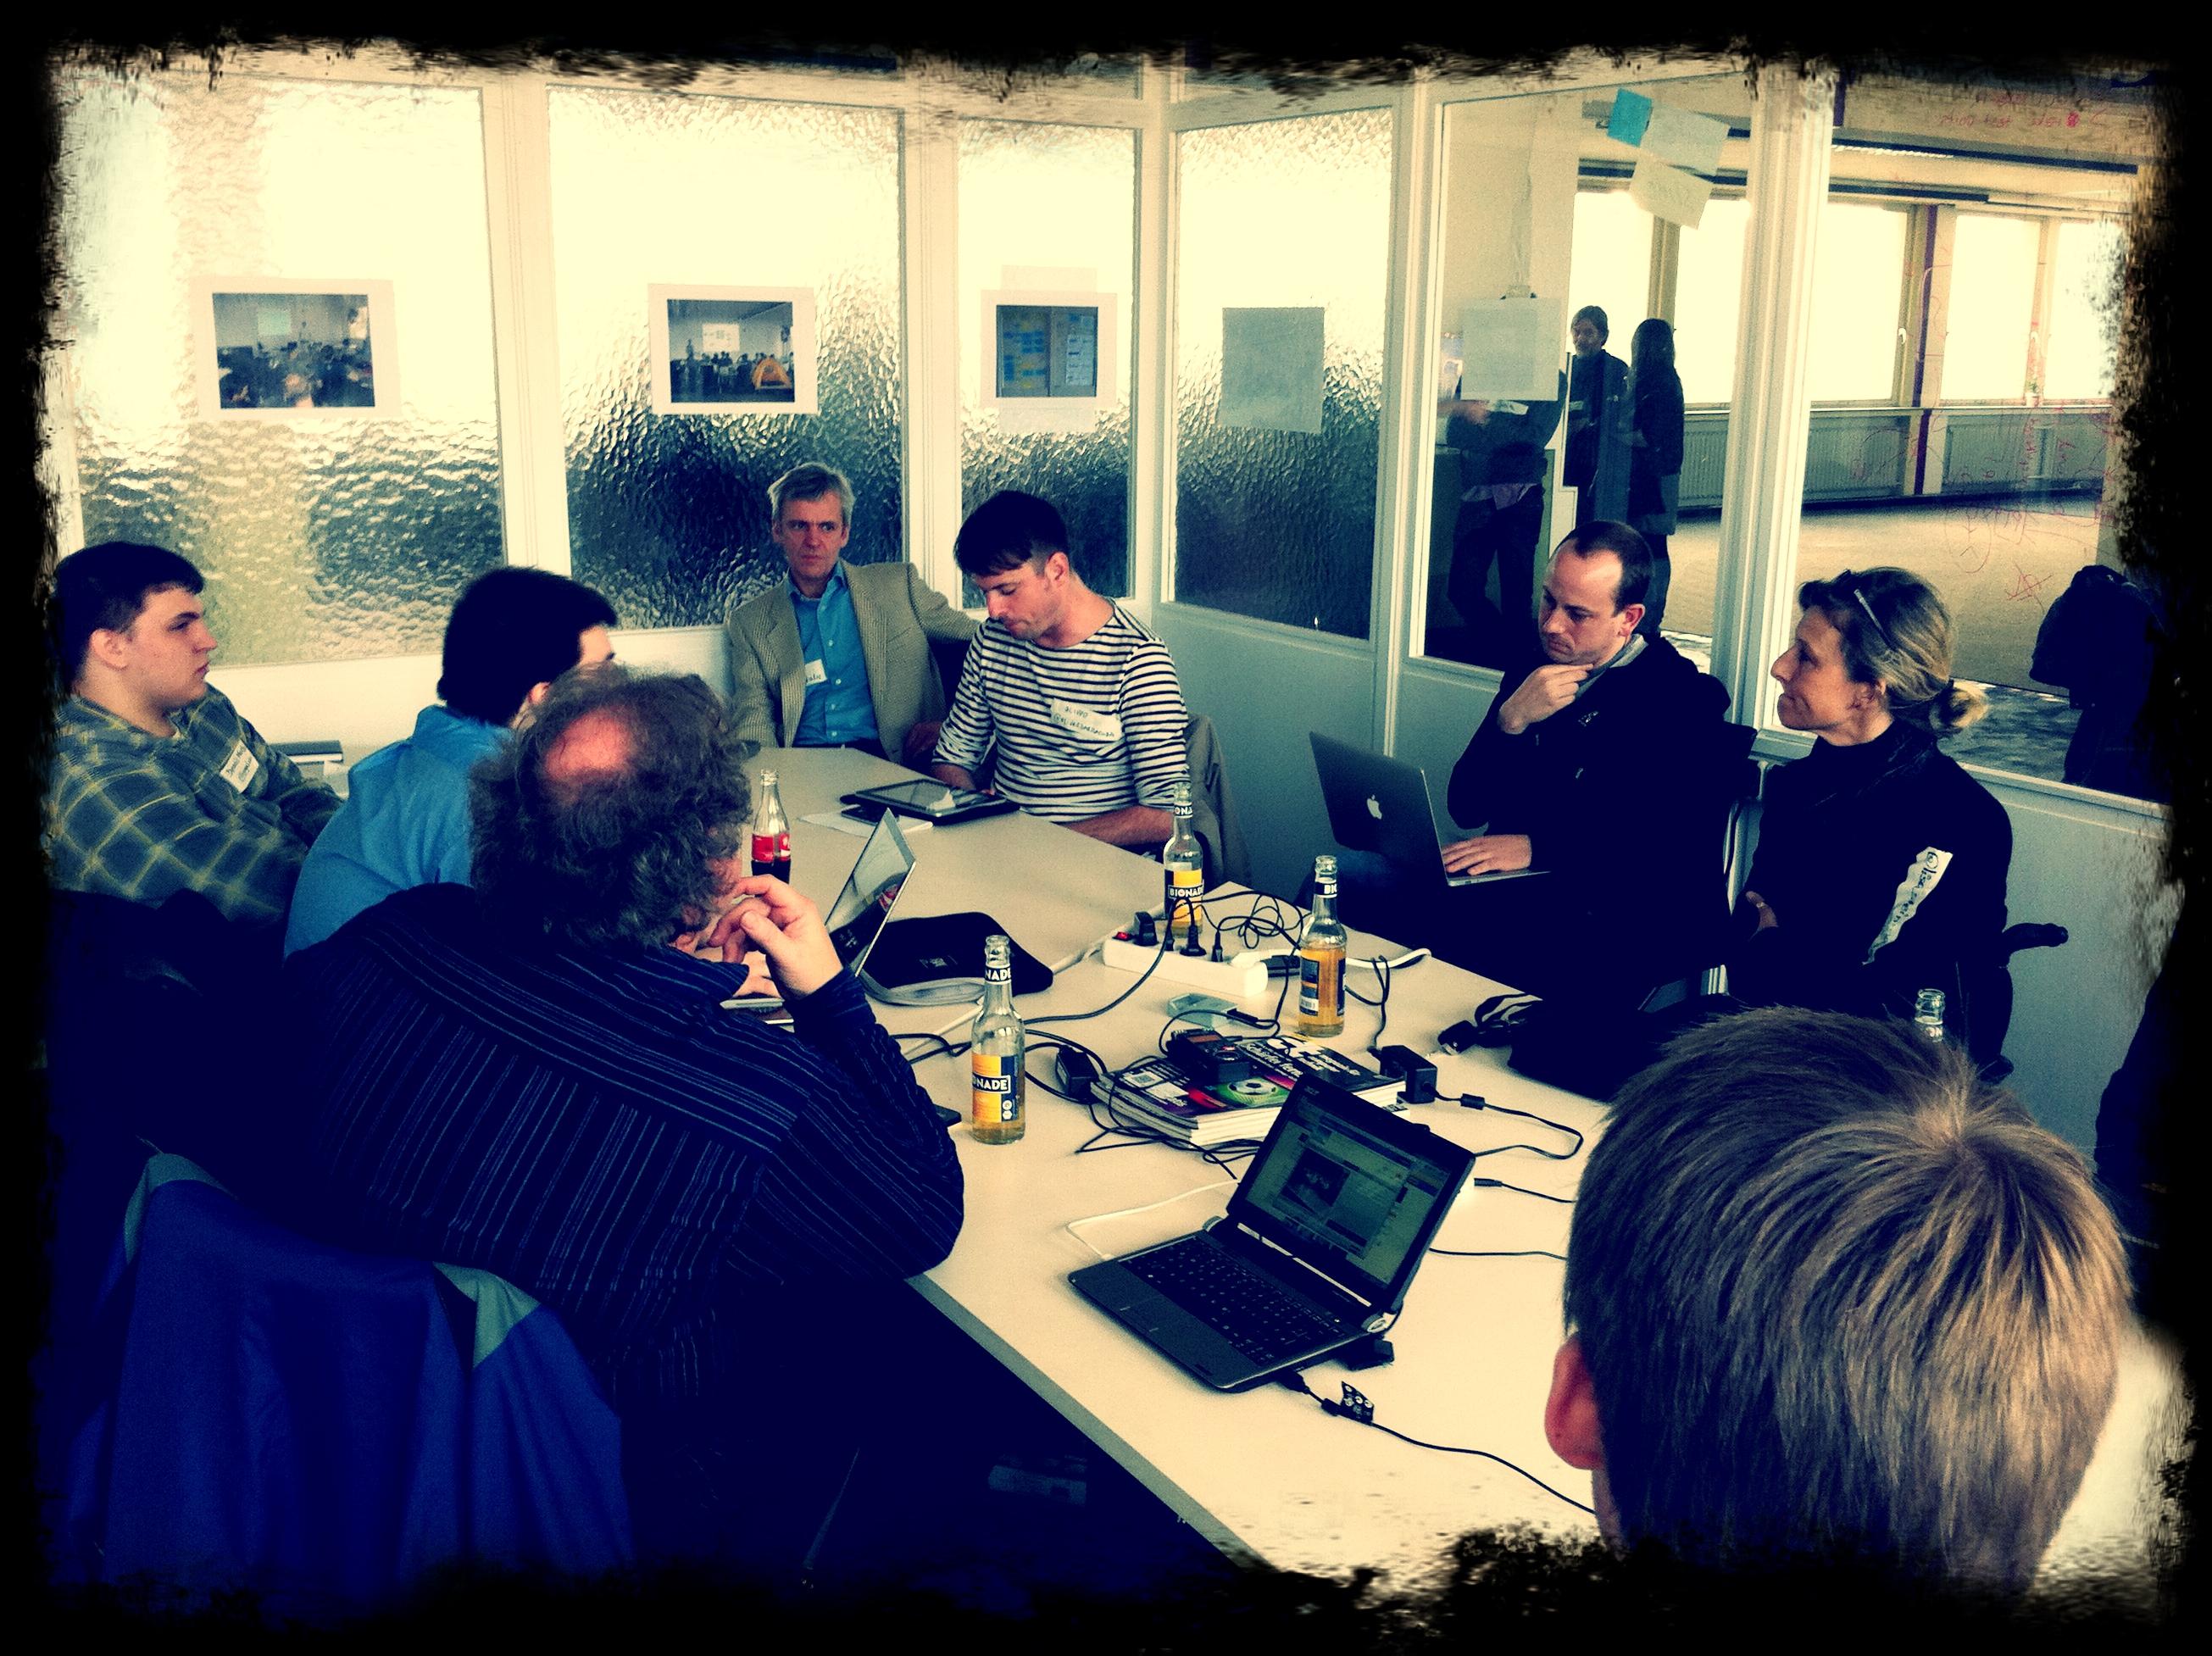 Barcamp als Bürgerbeteiligung